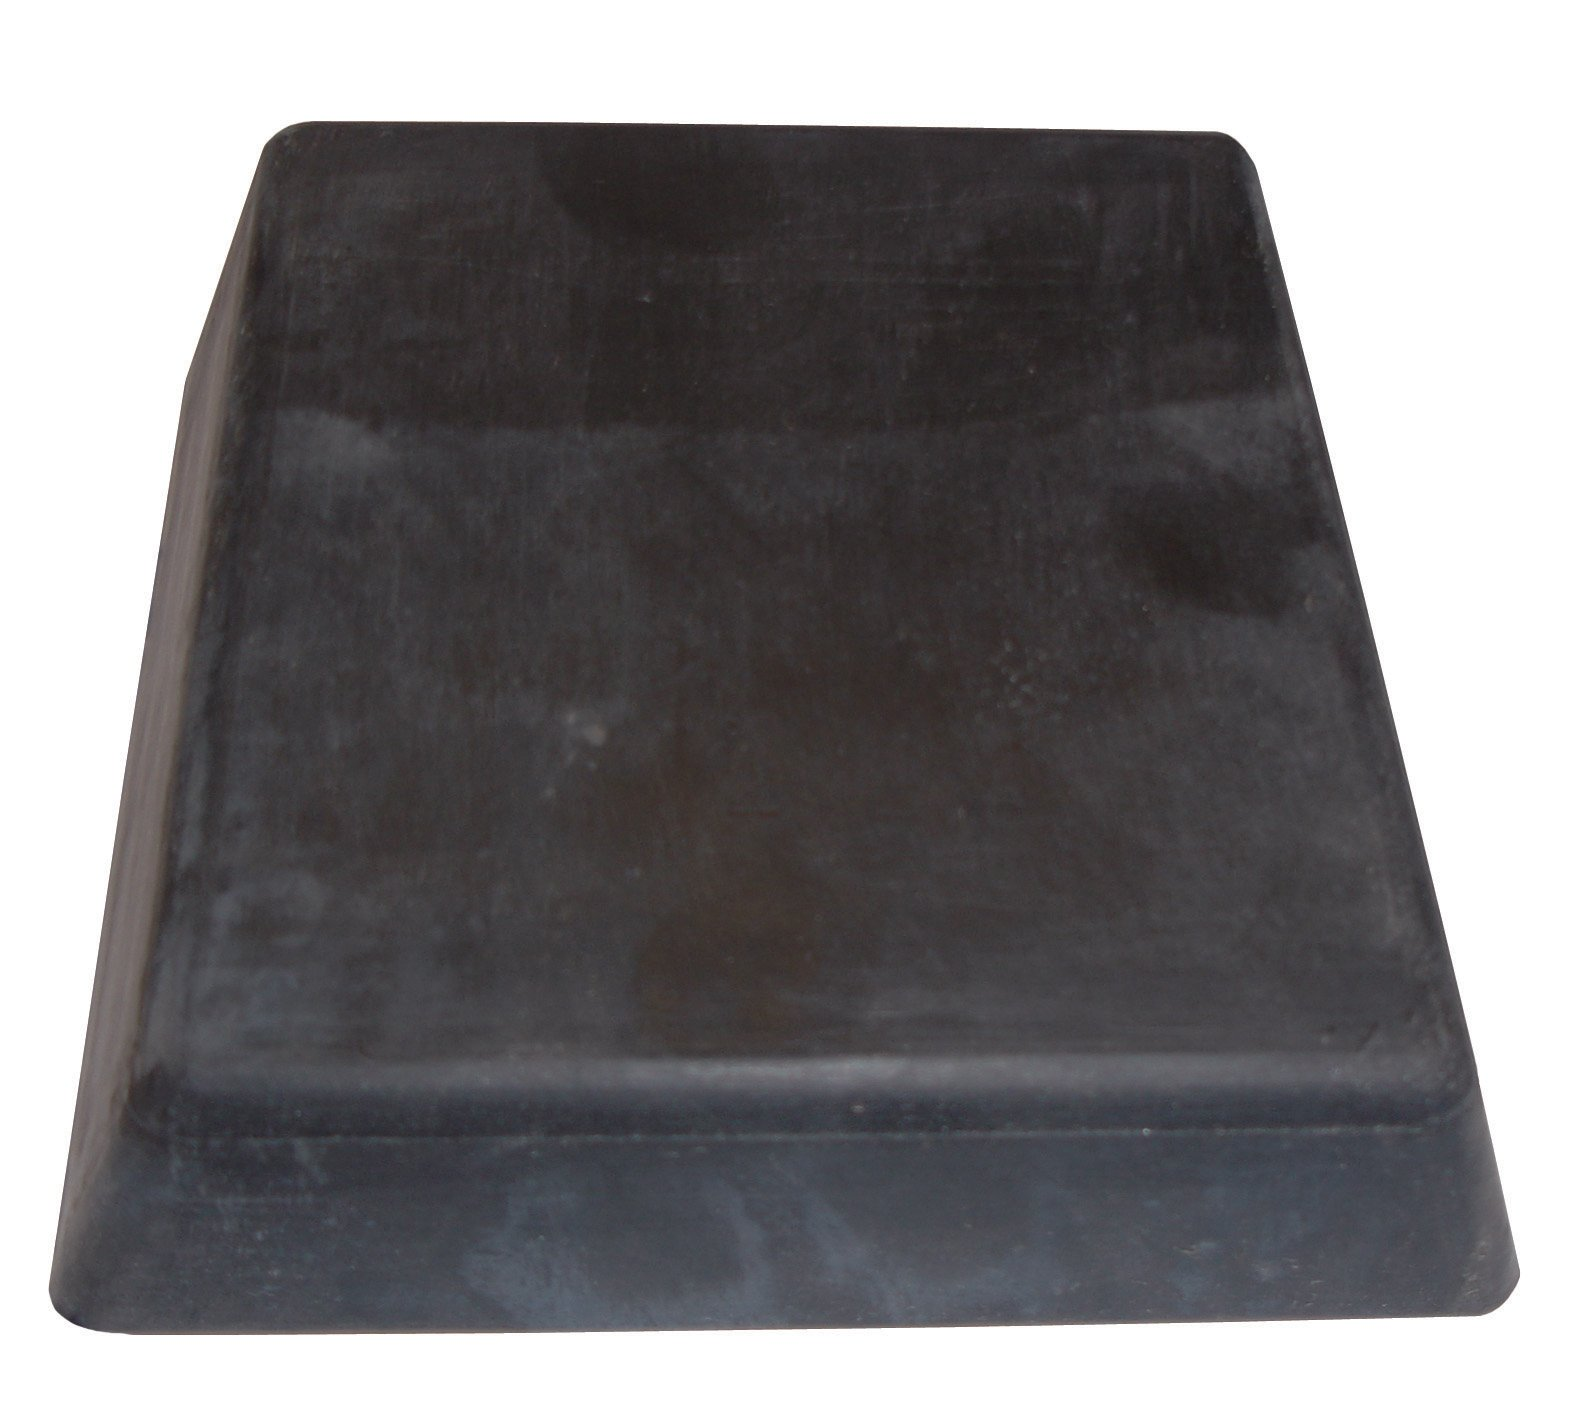 Shark 51654 Center Rubber Pad for Coats Tire Changer